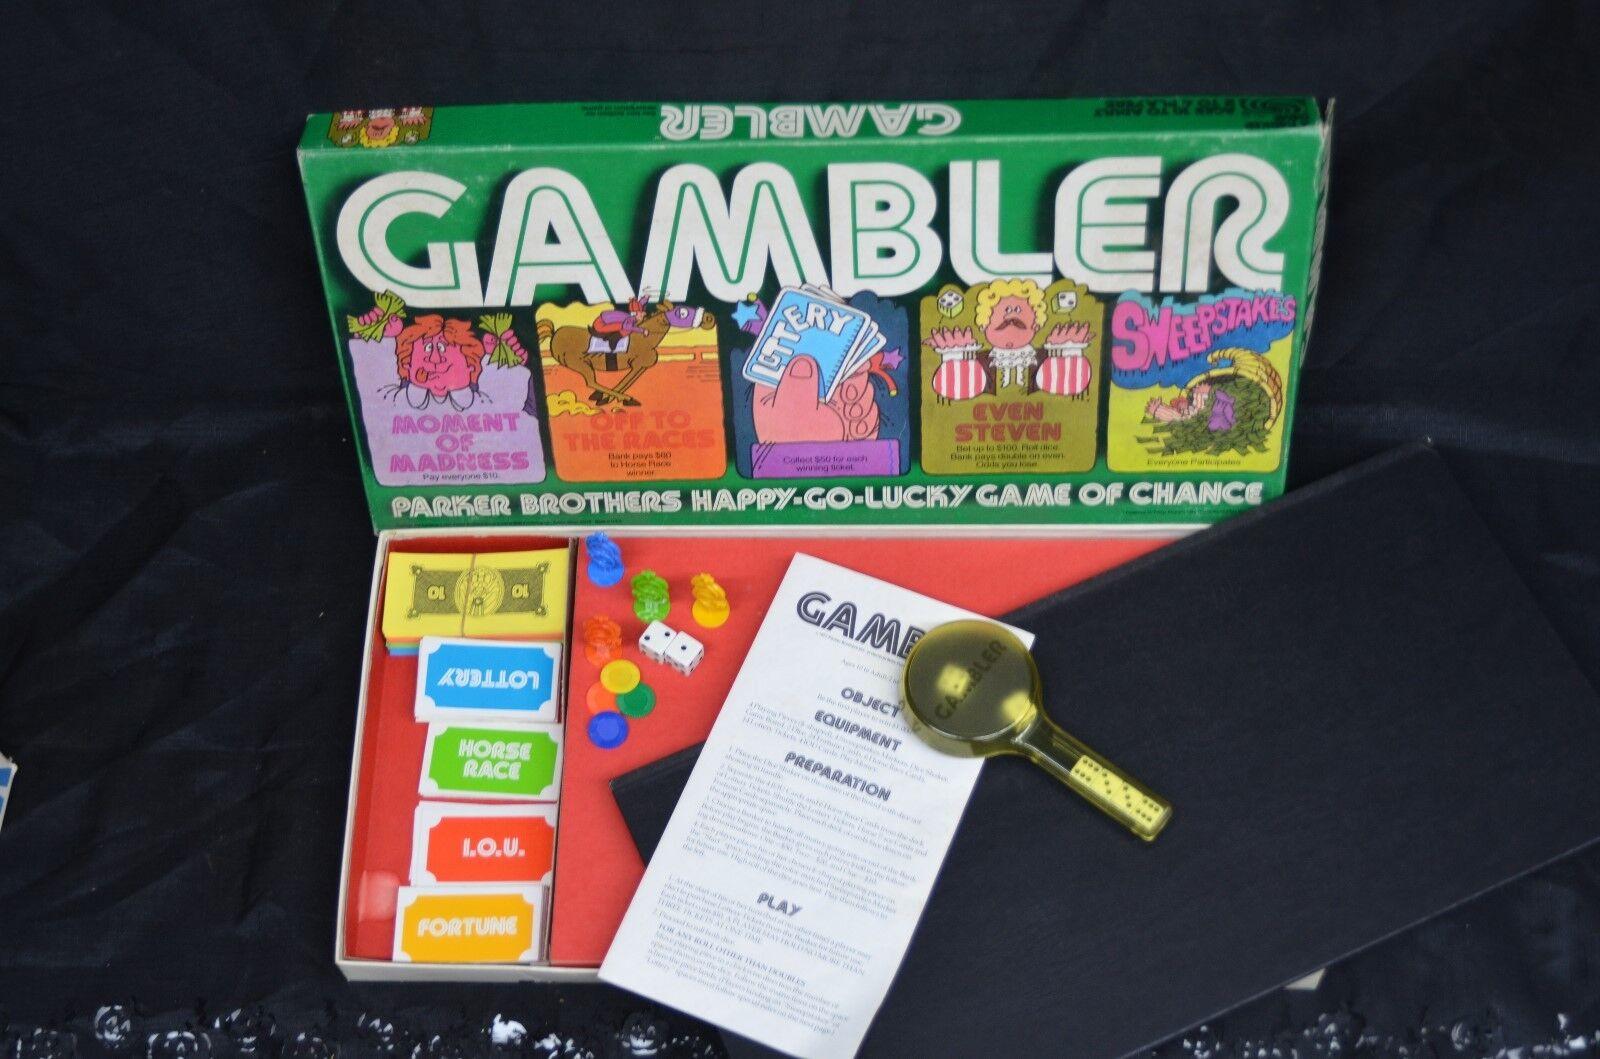 Jahrgang 1977 parker brothers spieler brettspiel komplette nr. 49 gamblig casino